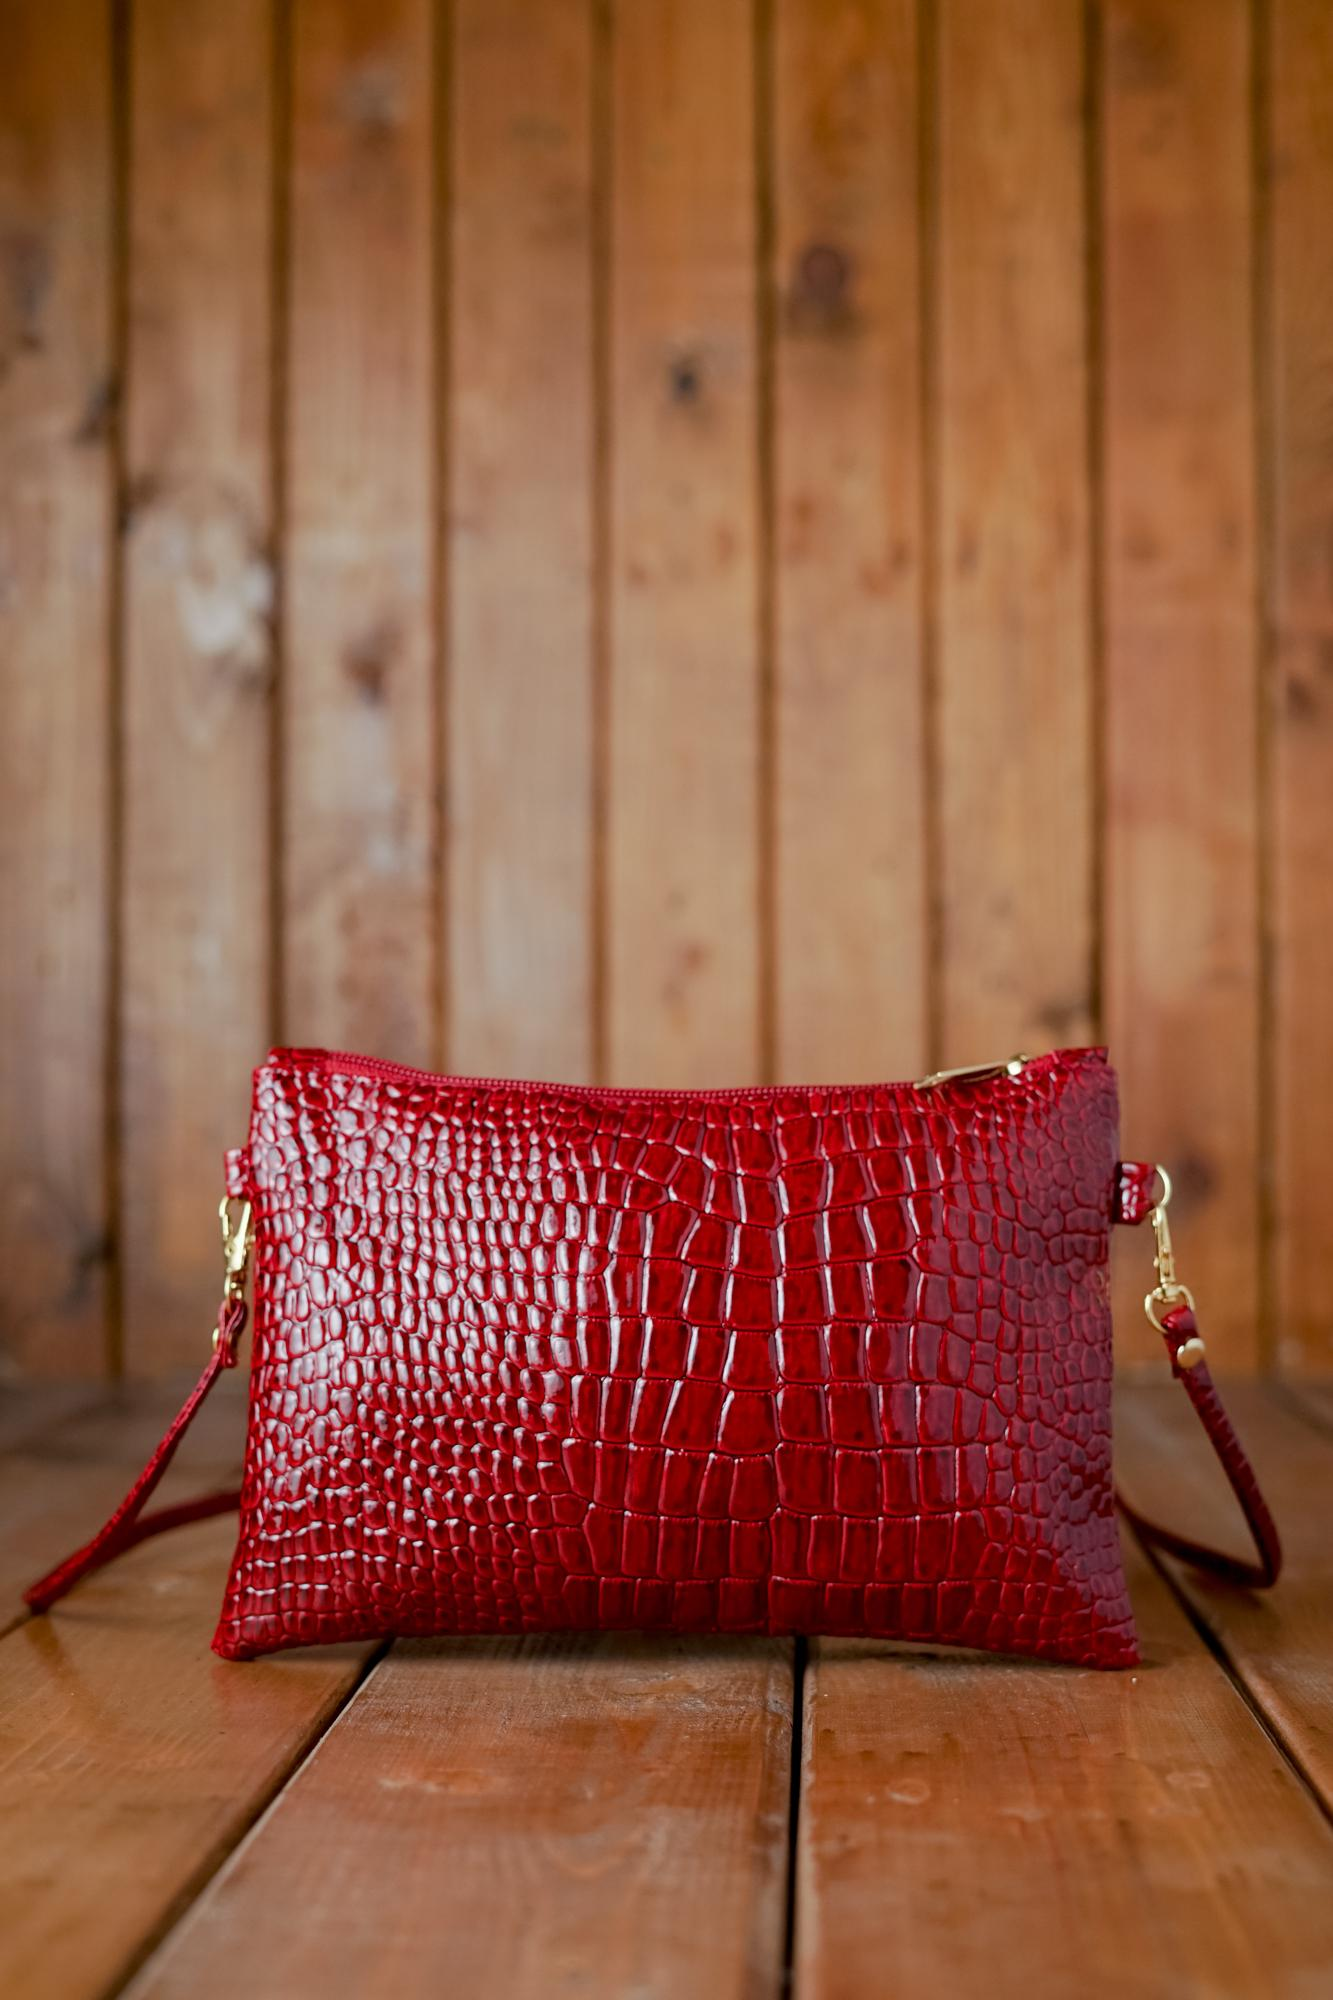 Buy Sell Cheapest Zelig Official Tas Best Quality Product Deals Selempang Fashion Korea Offical Mini Sling Bag Wanita Motif Crocodile Korean Dompet